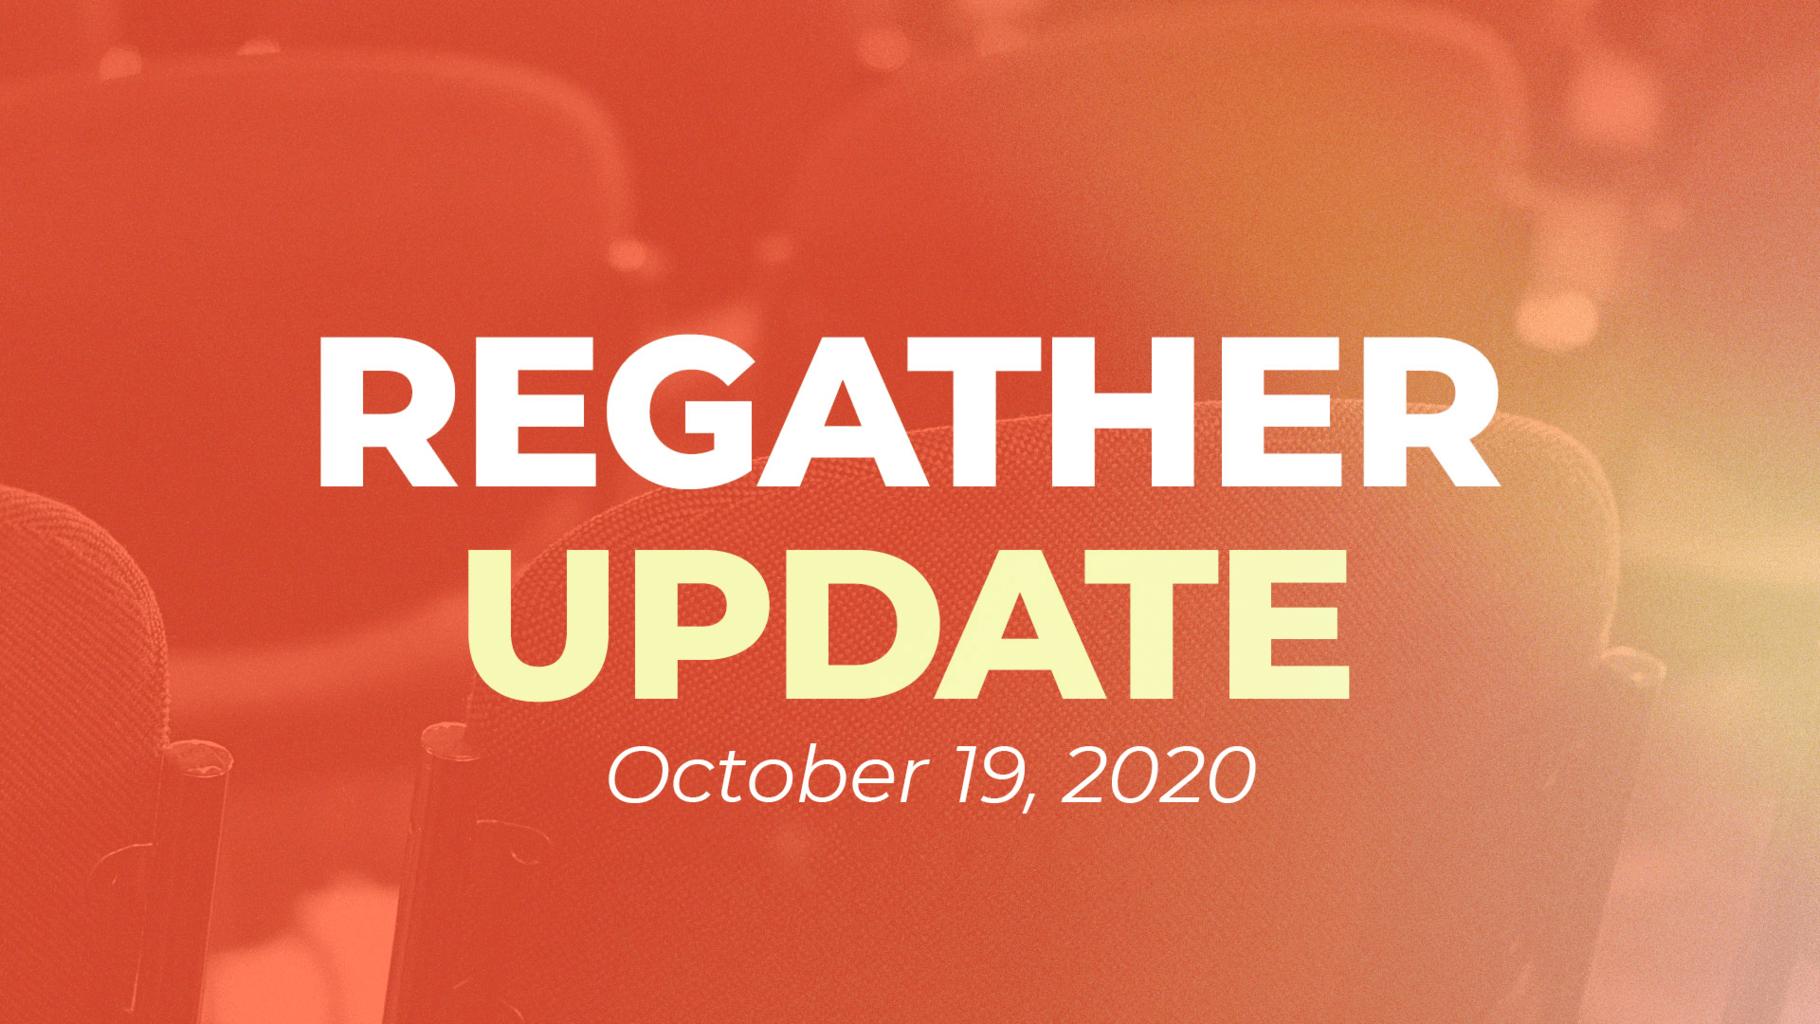 Regathering Update 10-19-20